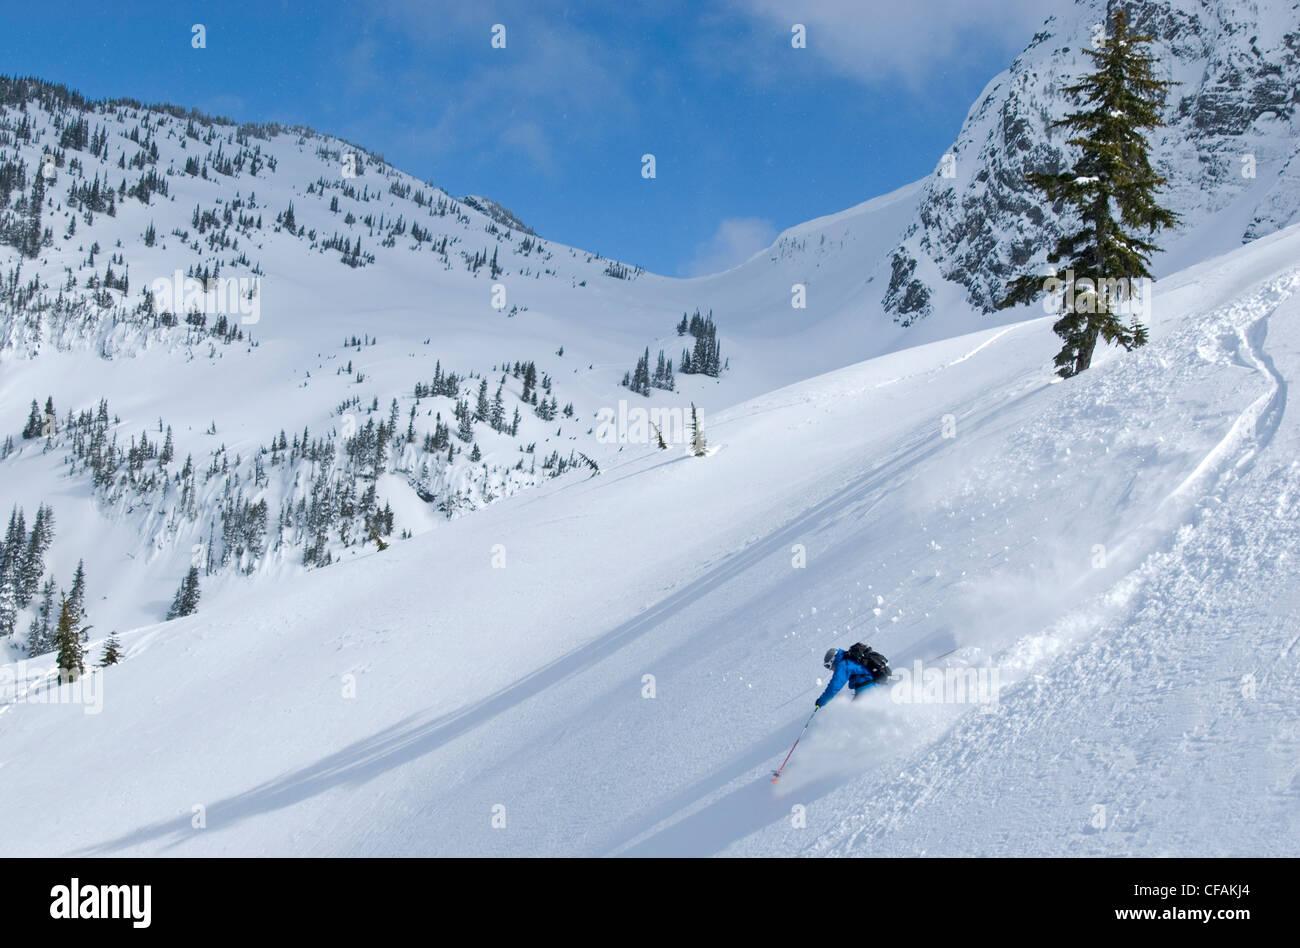 Skier hitting the powder below Nak Peak in Thar Basin Cascade Mountains, British Columbia, Canada. - Stock Image